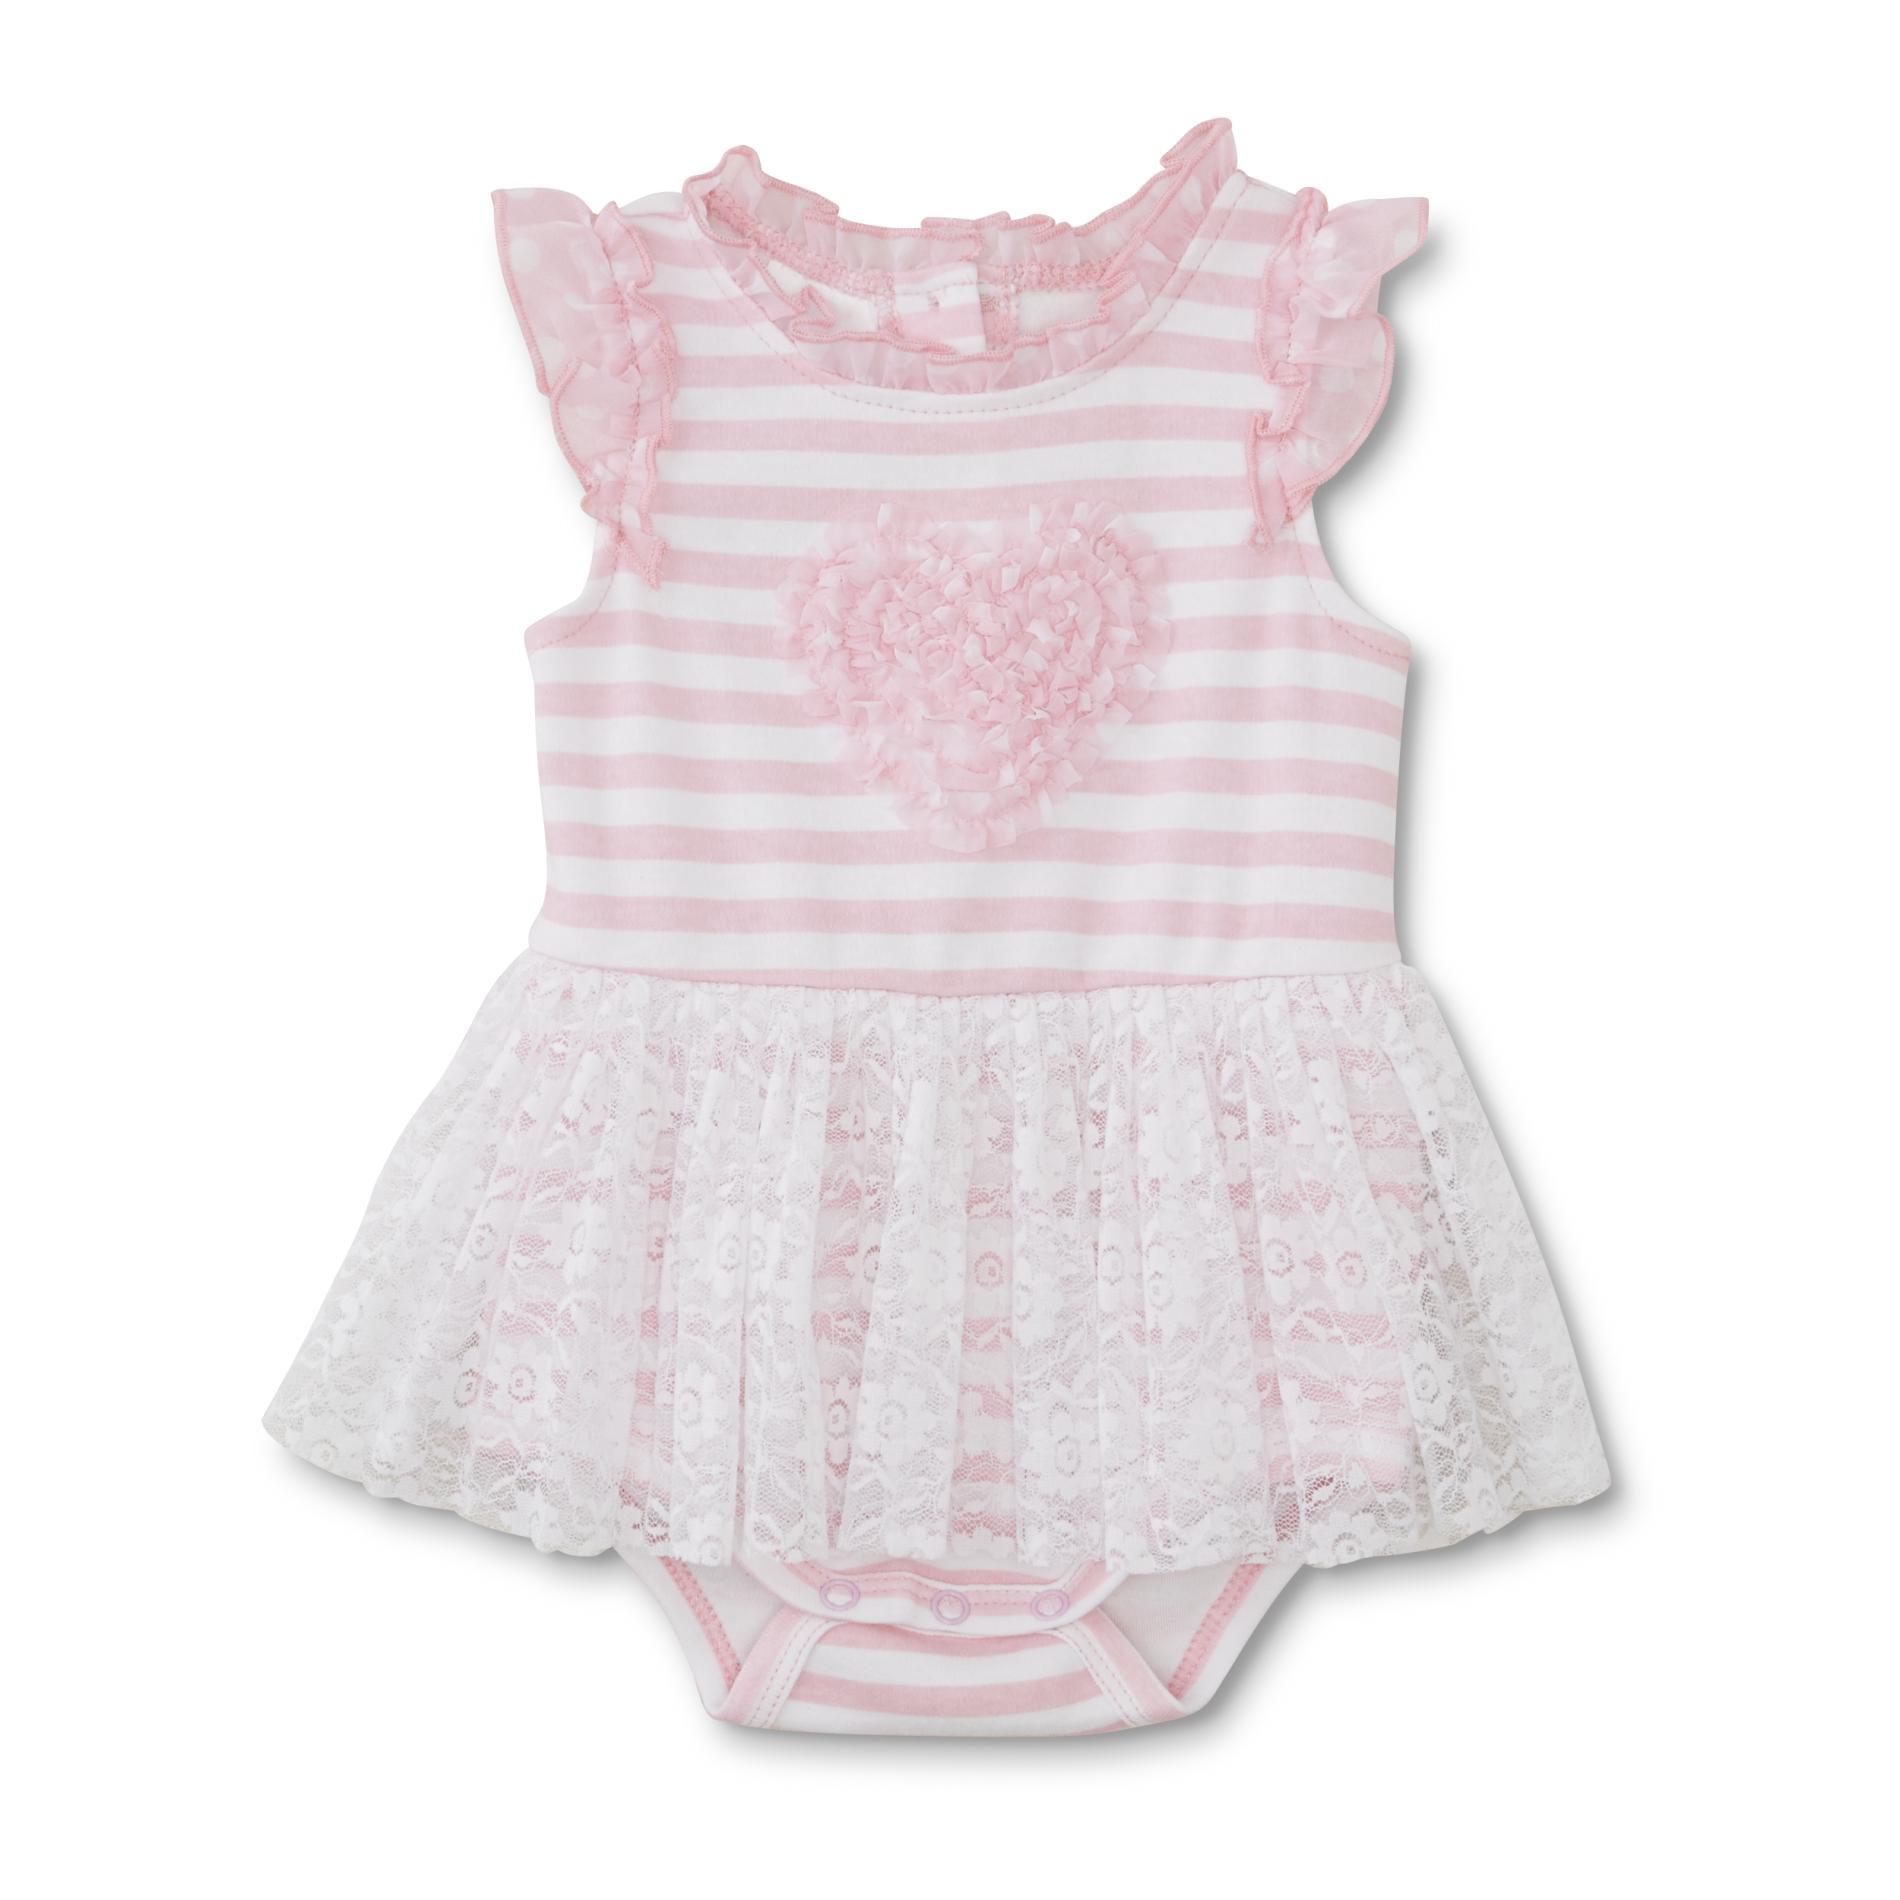 Small Wonders Newborn Girl's Skirted Bodysuit - Striped